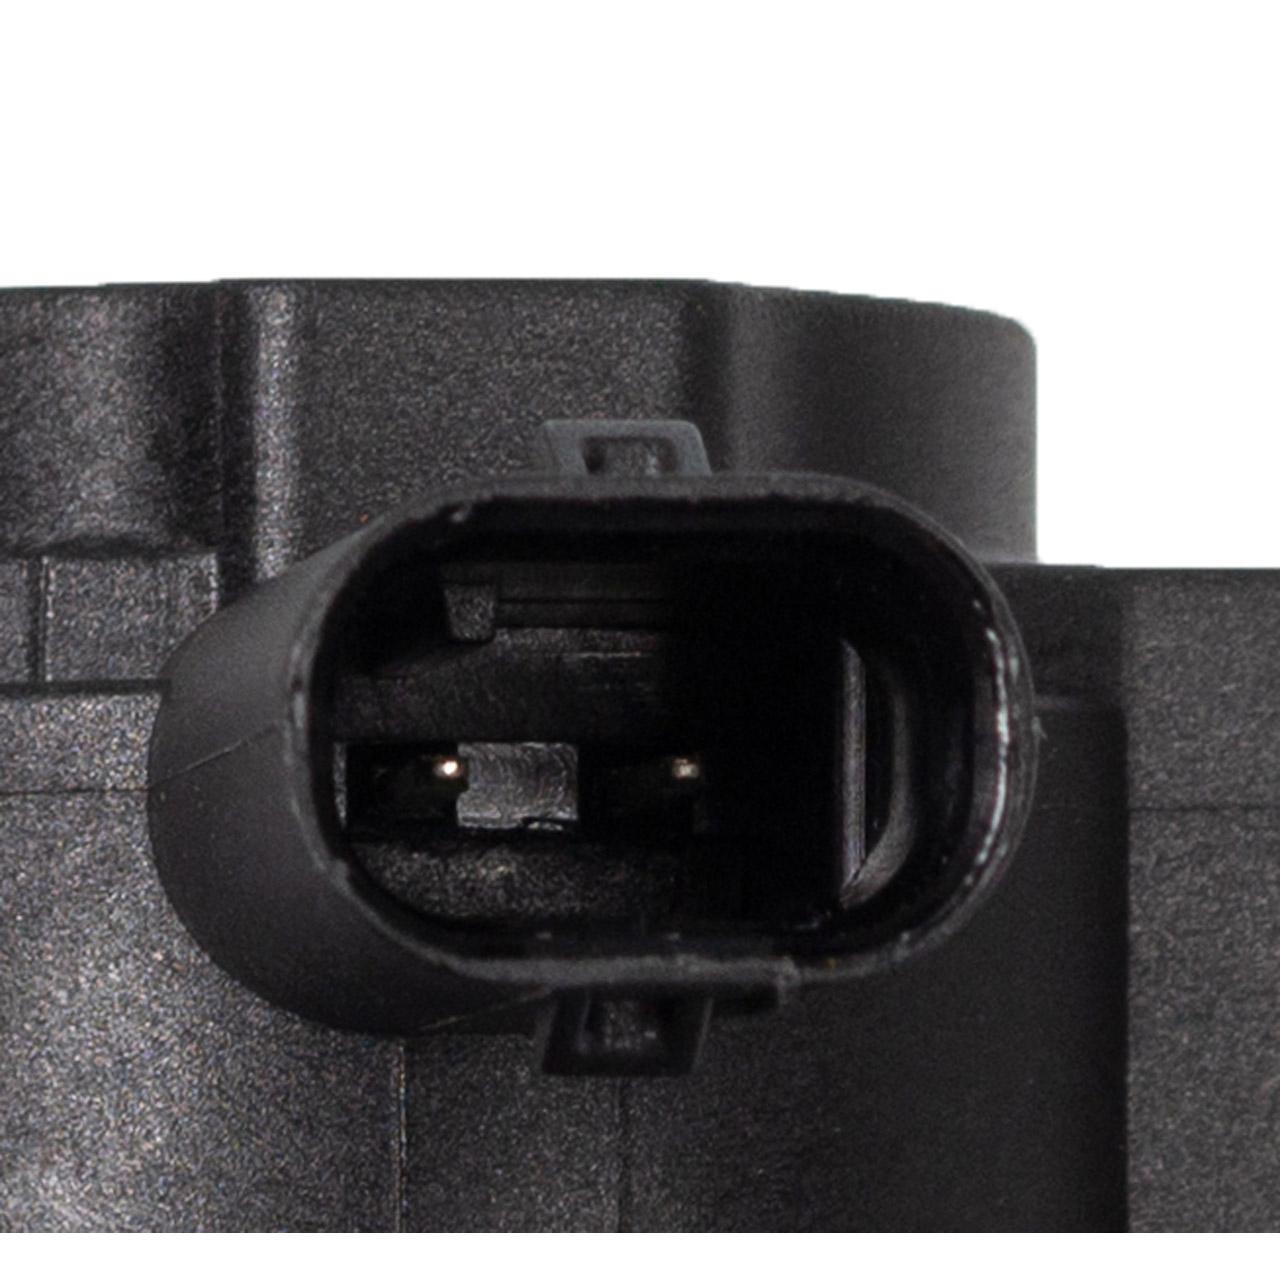 A.I.C. Druckwandler Abgassteuerung MERCEDES A-Klasse W169 Sprinter 5t 906 SMART ForTwo 405